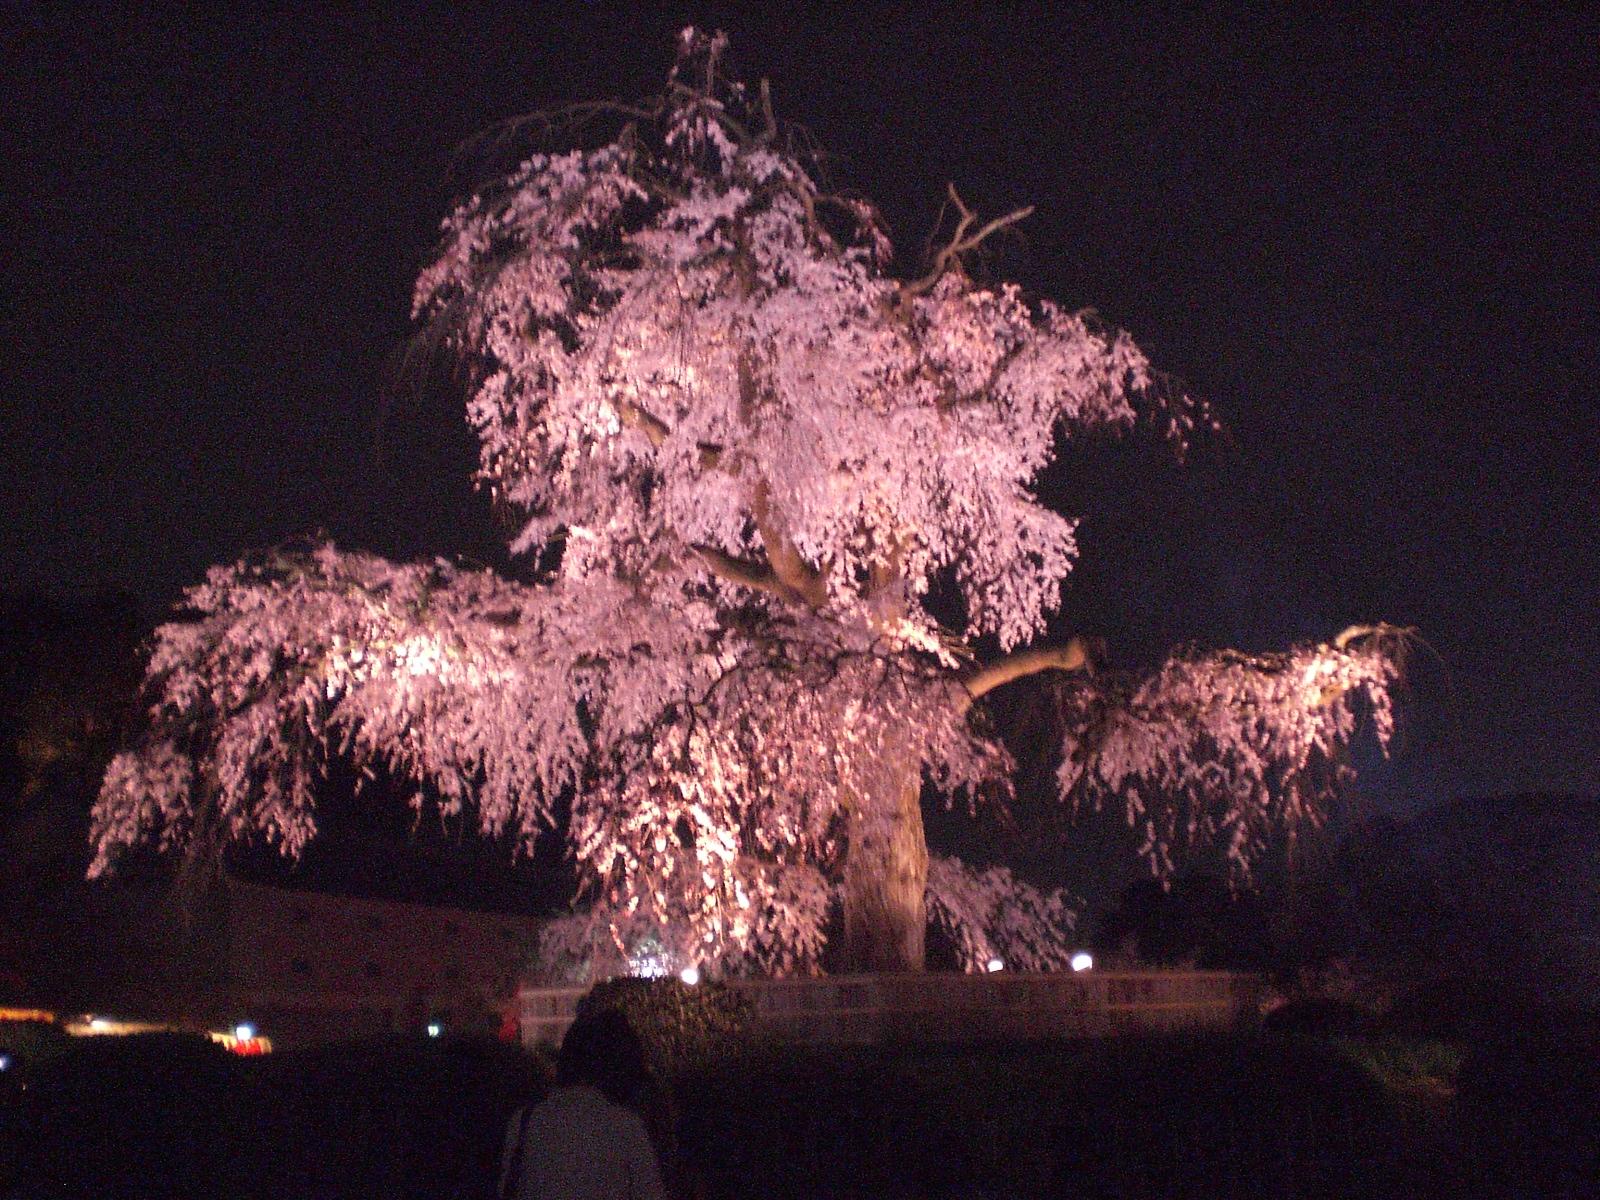 Cool Wallpaper Night Cherry Blossom - night_shot_of_cherry_blossoms_by_narmi89  Photograph.jpg